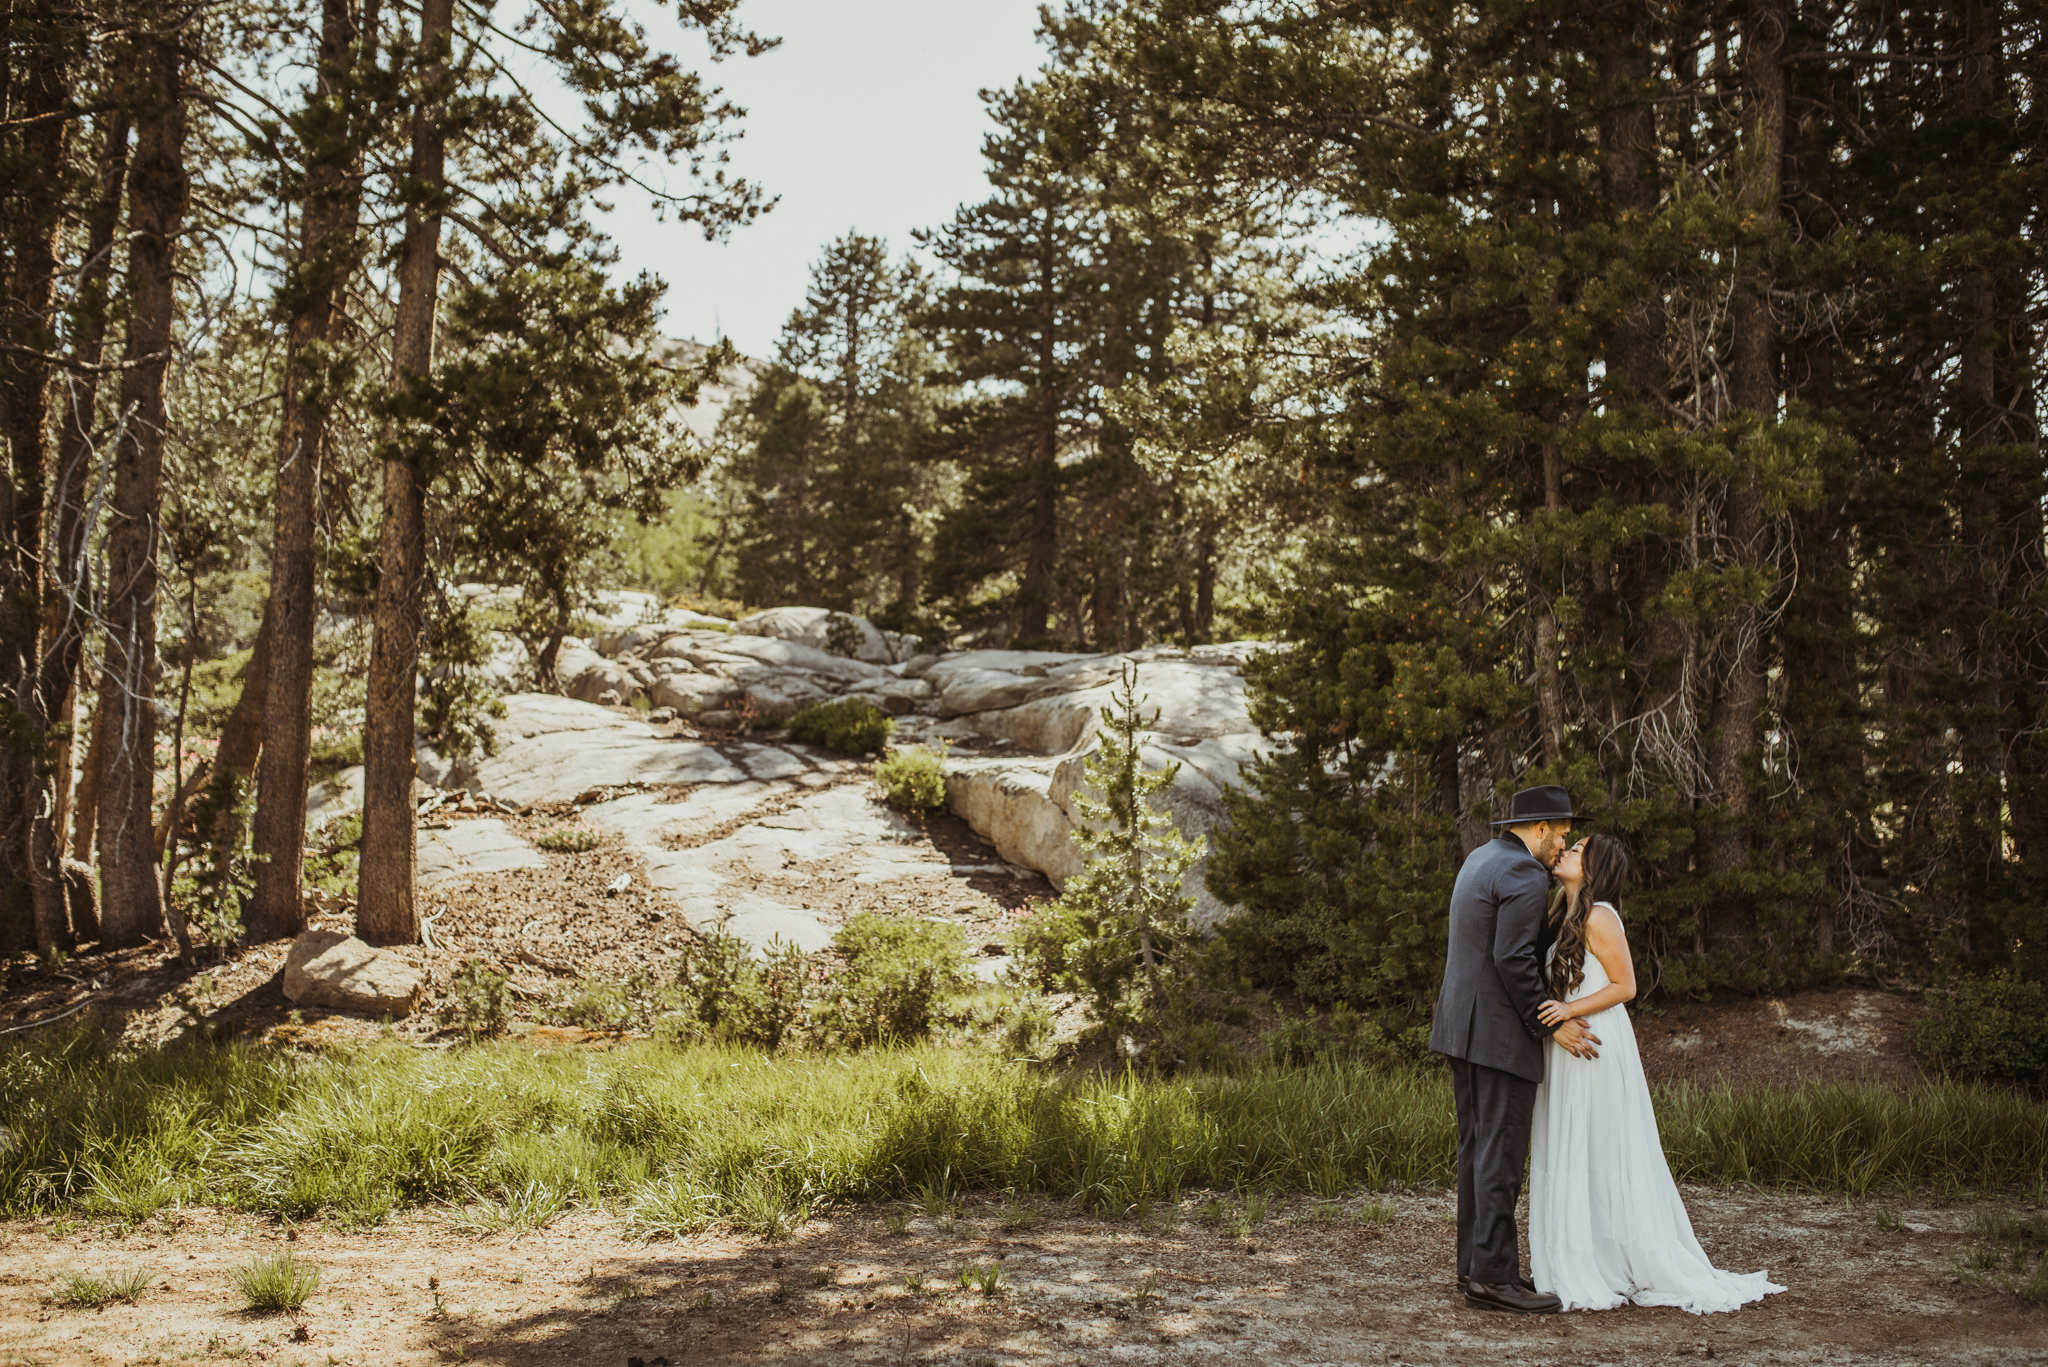 ©Isaiah & Taylor Photography -The Hideout Wedding, Kirkwood California, Lake Tahoe Wedding Photographer-76.jpg